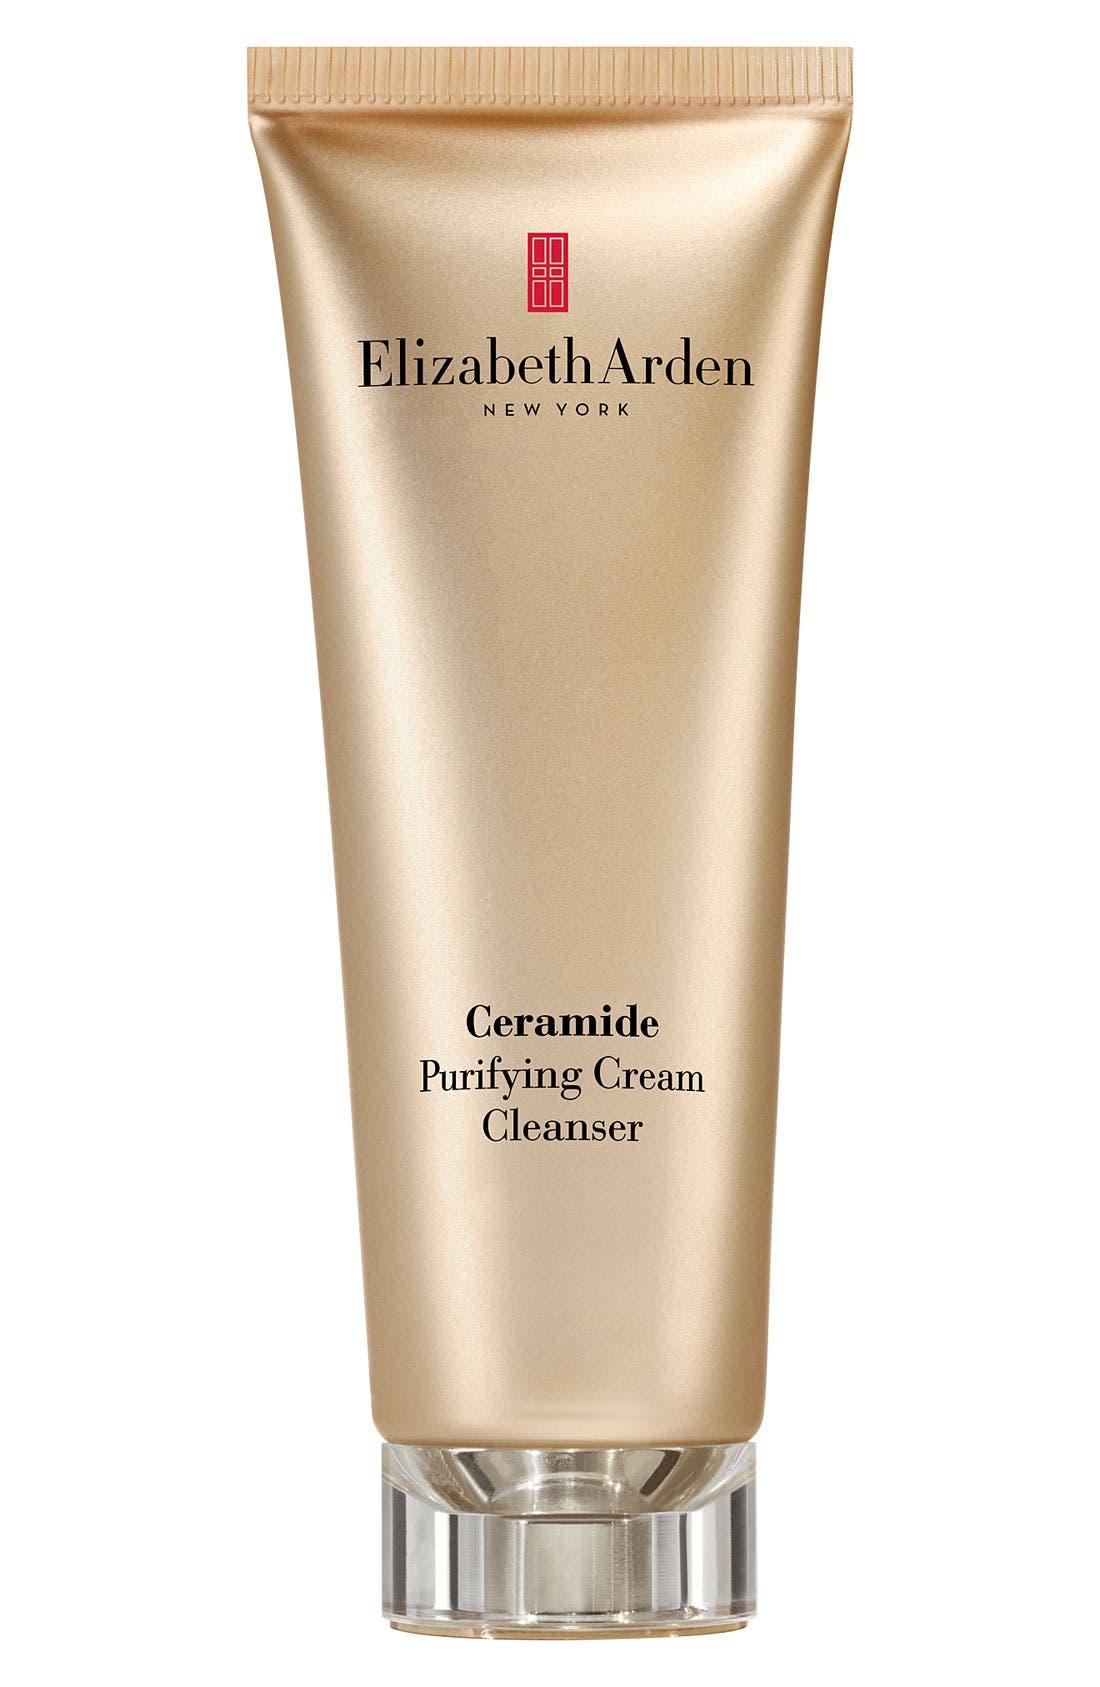 Elizabeth Arden All Beauty Fragrance Nordstrom